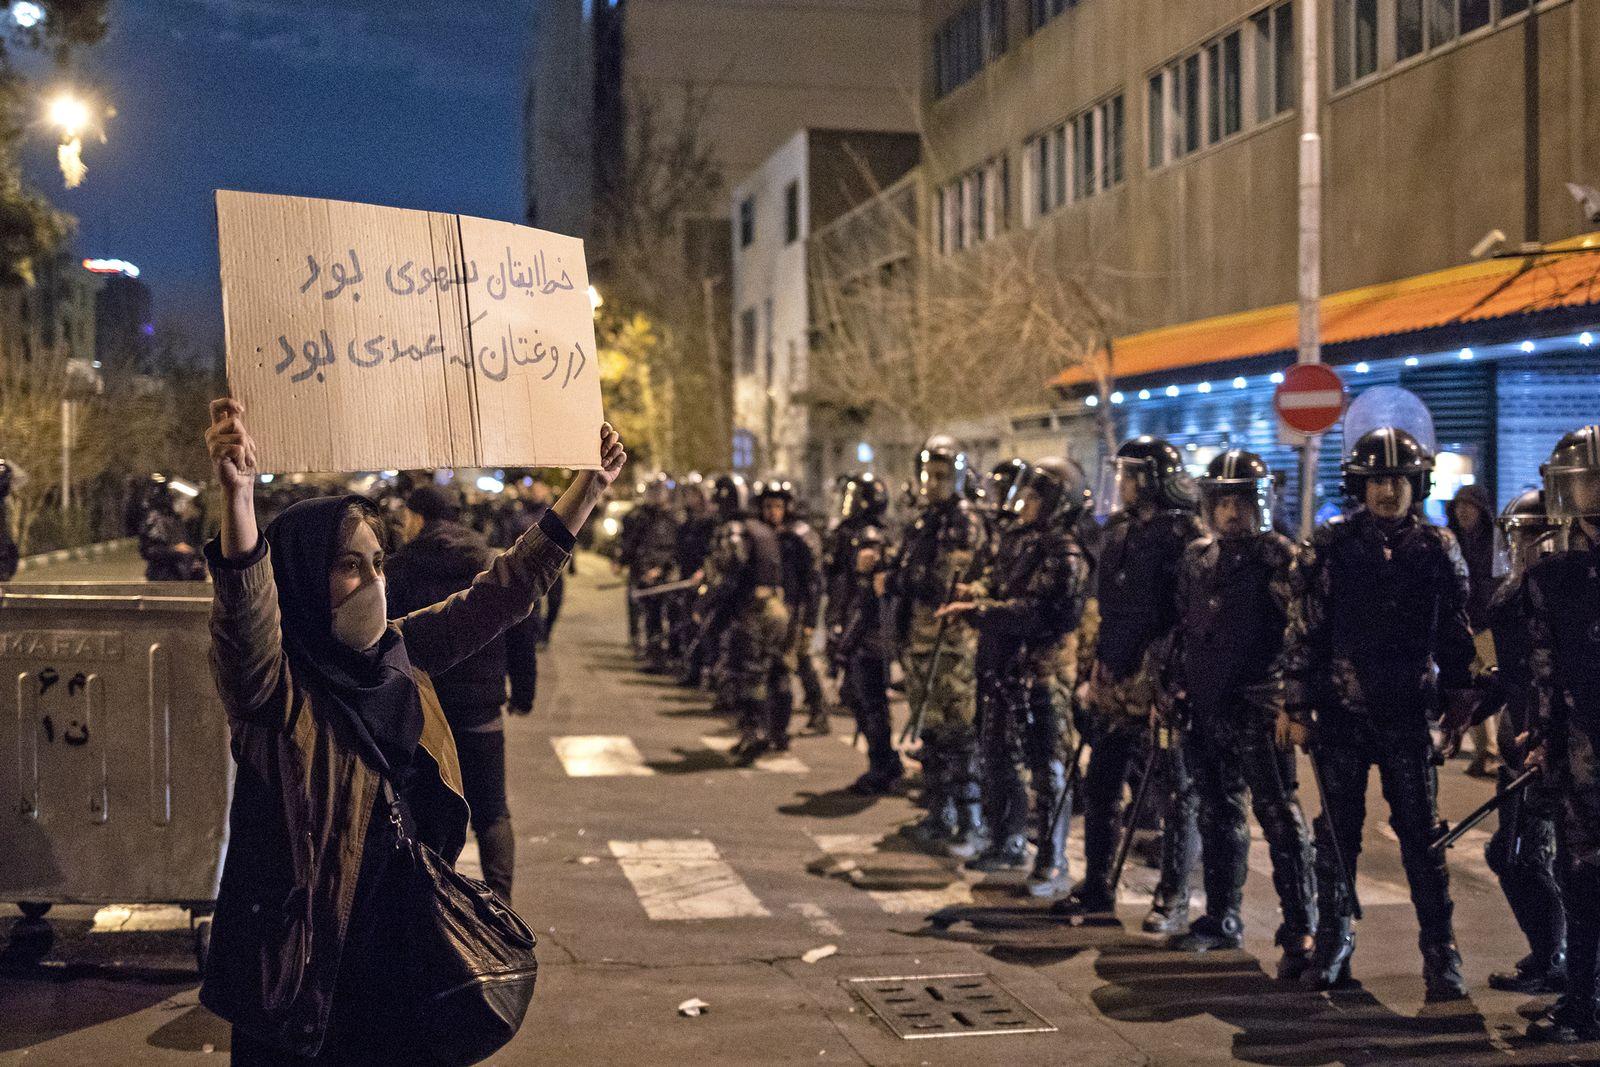 IRAN-POLITICS-PROTEST